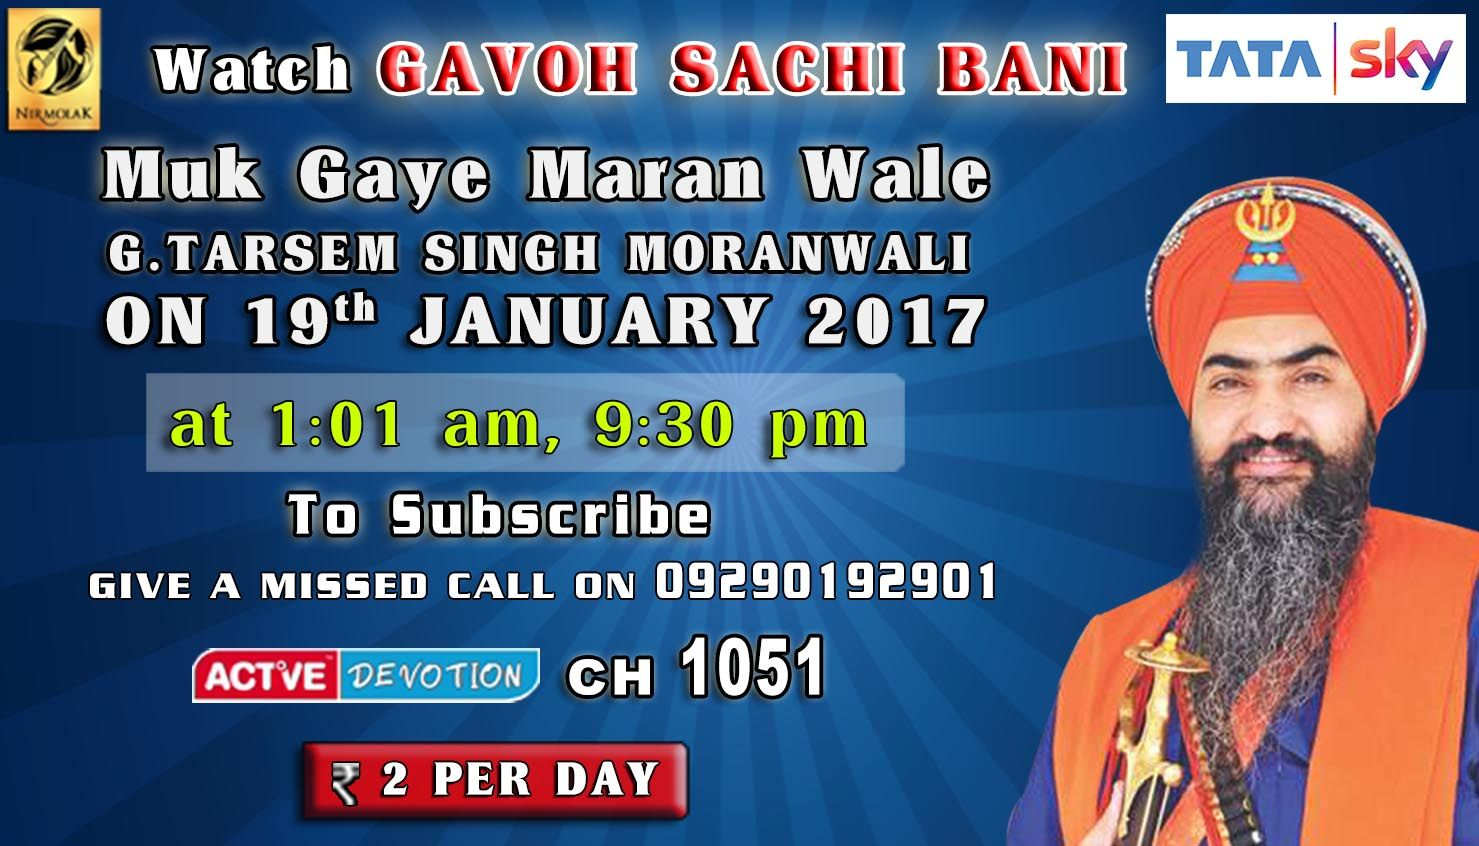 19th January Schedule of Tata Sky Active Devotion Gurbani